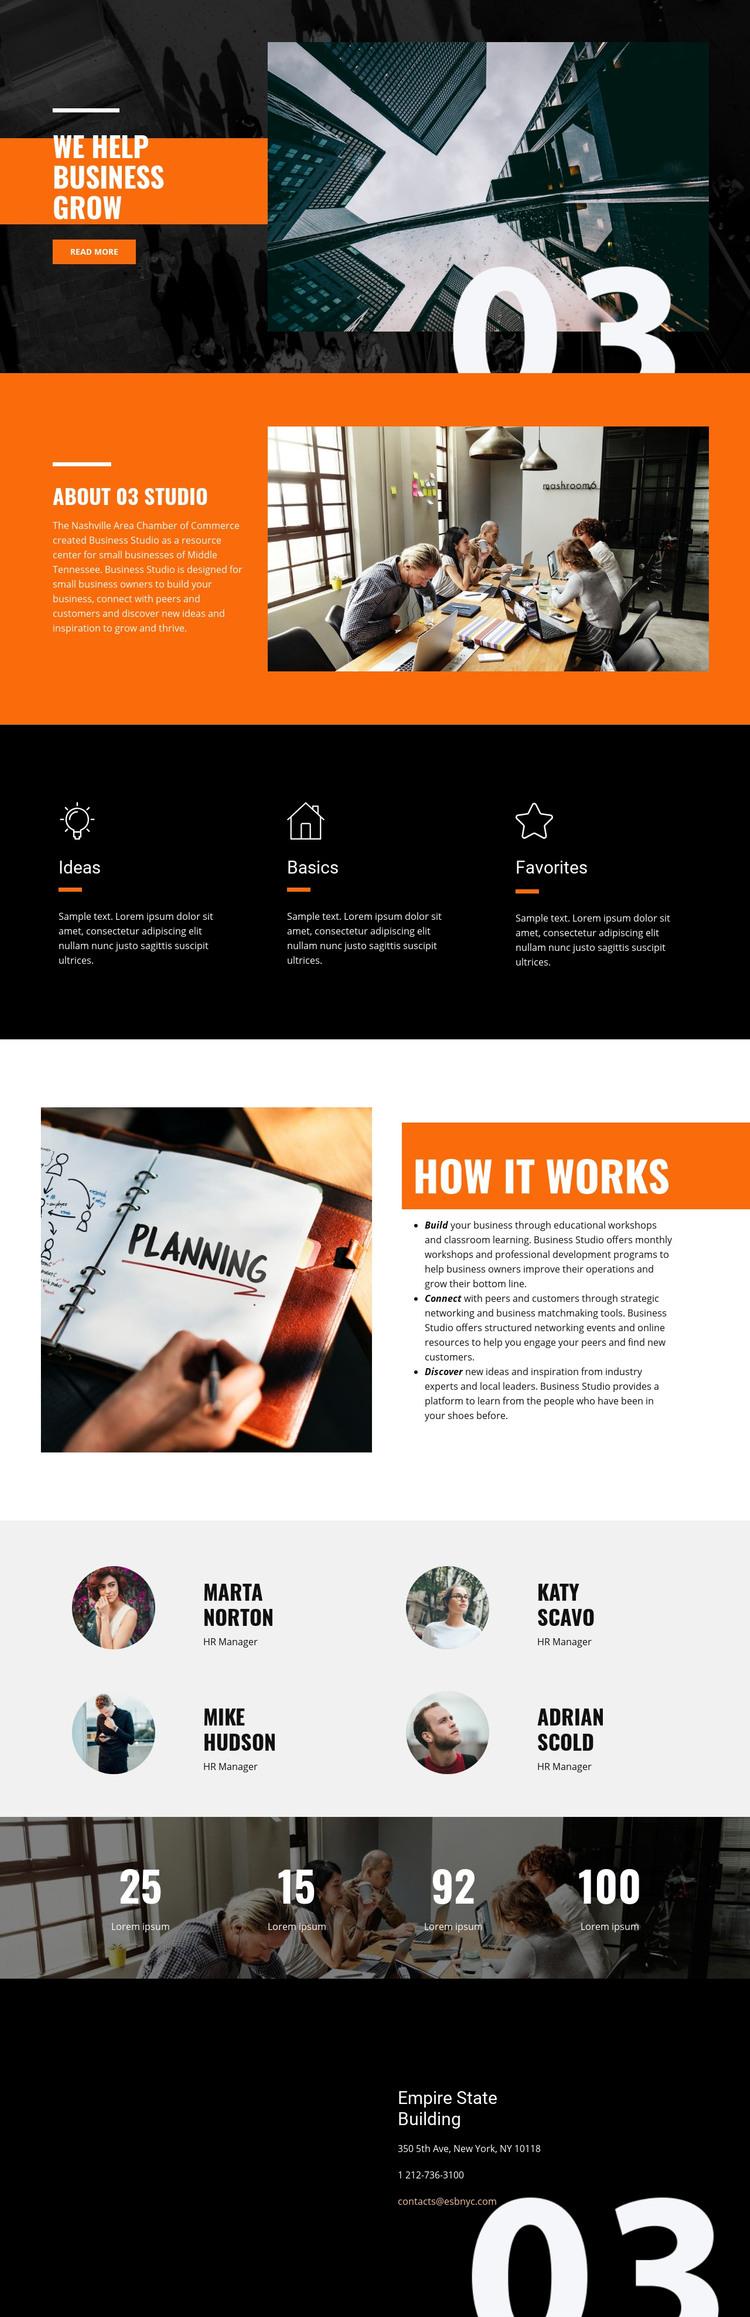 Business Grow Homepage Design